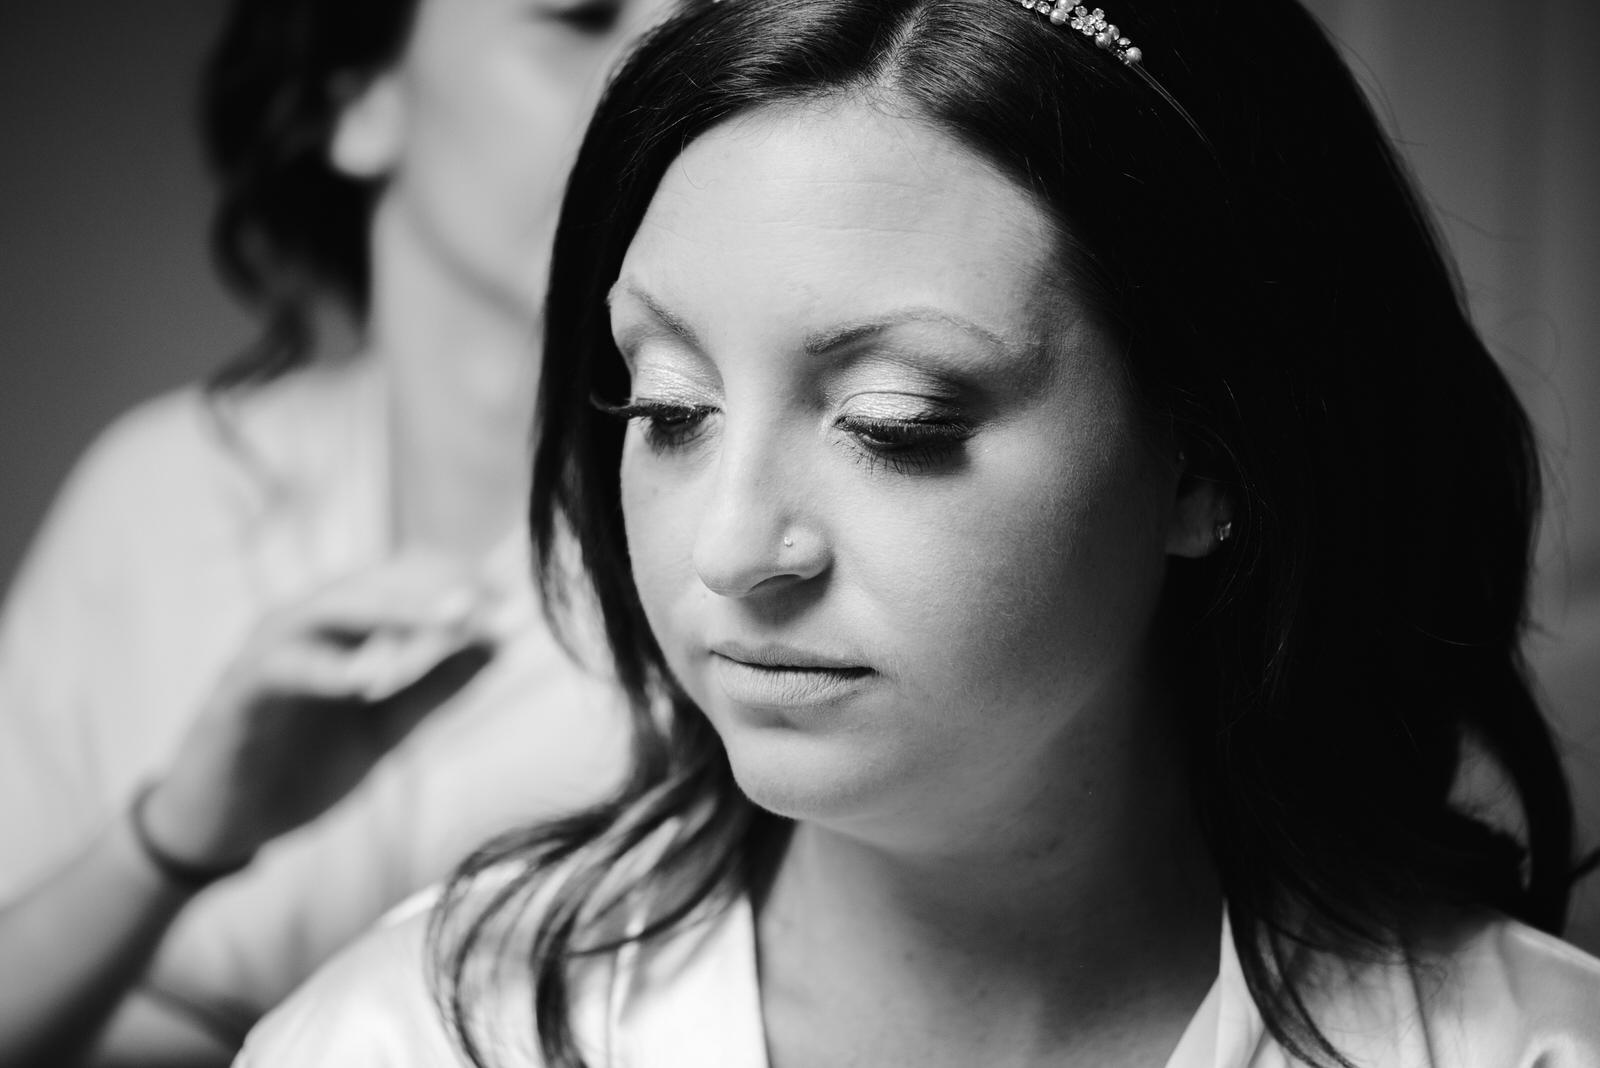 Laube_Banquet_Hall__Wedding_Photos_037.jpg